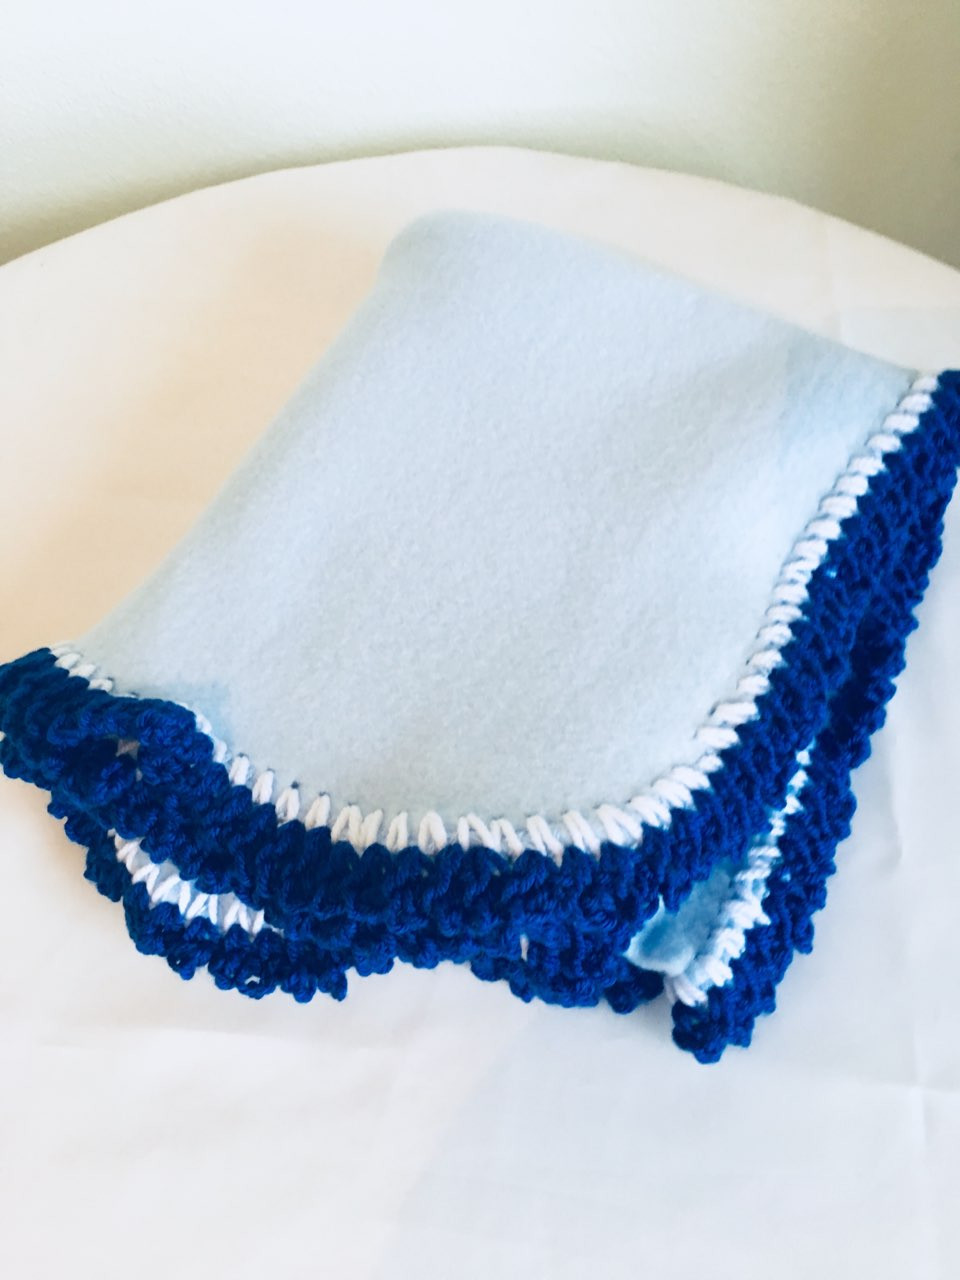 Royal Blue Cupcake Polar Fleece Baby Blanket French Designed Hand Crocheted Border White Royel Blue Free Shoping Shop1707llc